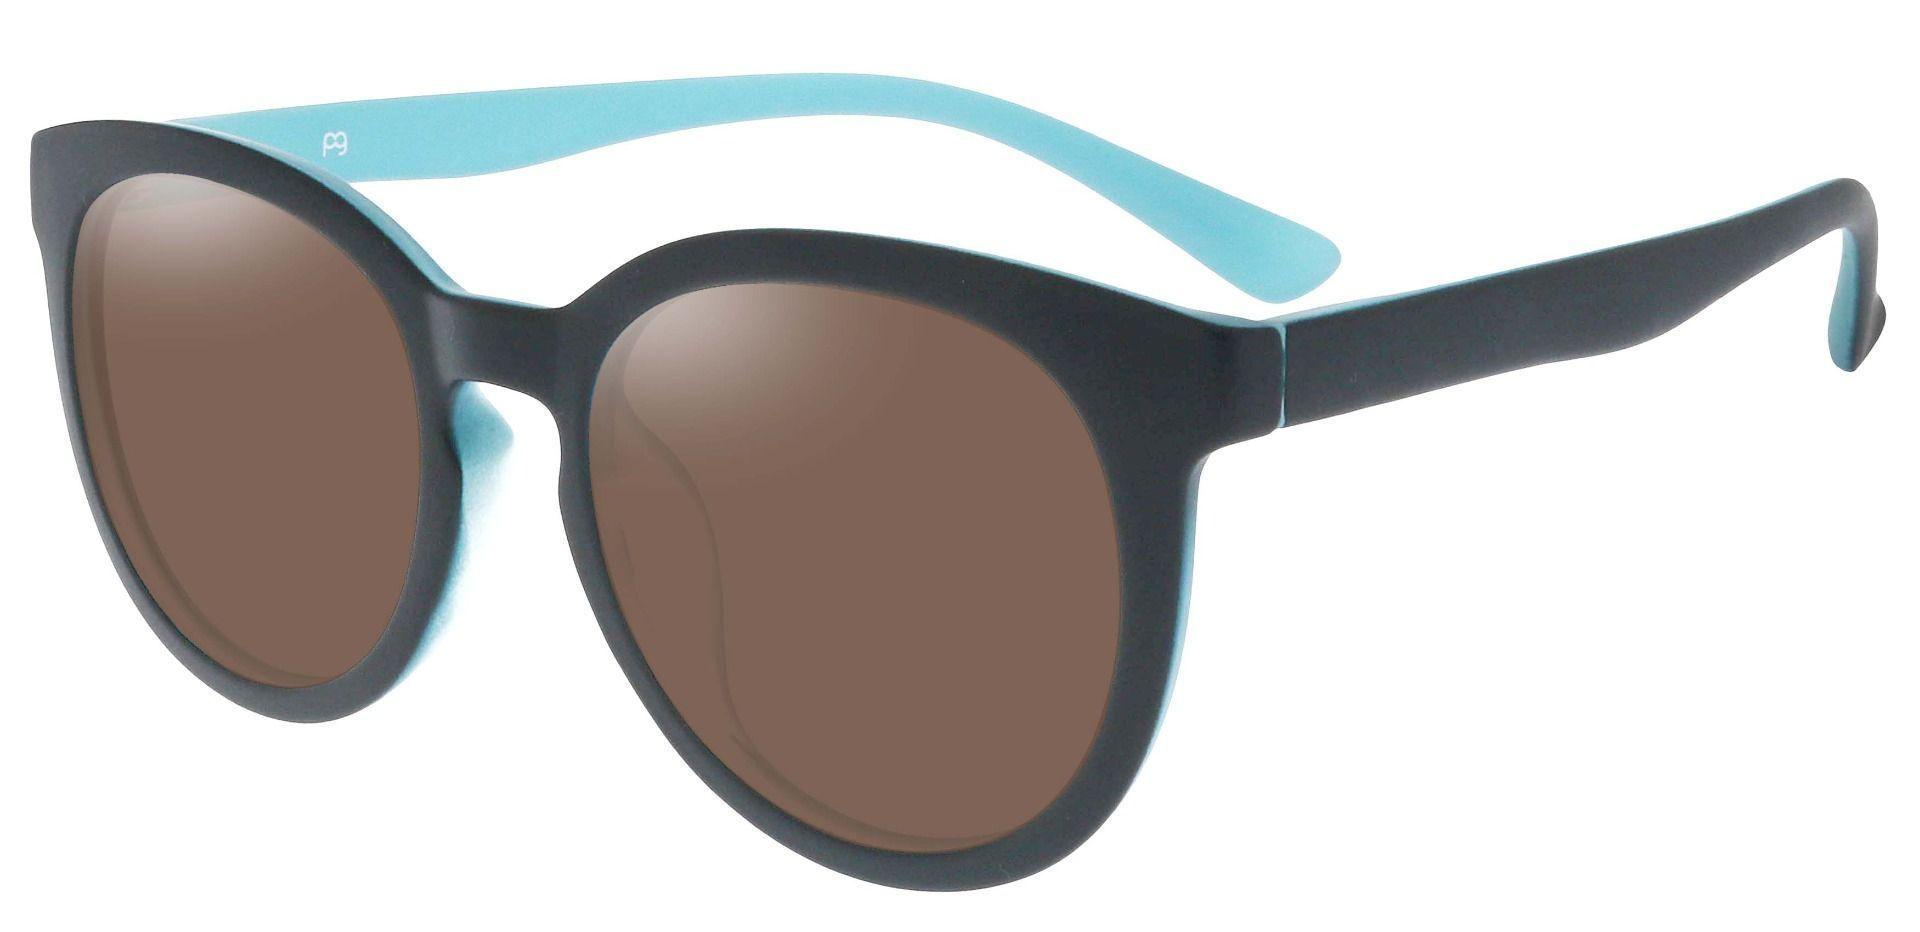 Dudley Oval Prescription Sunglasses - Black Frame With Brown Lenses